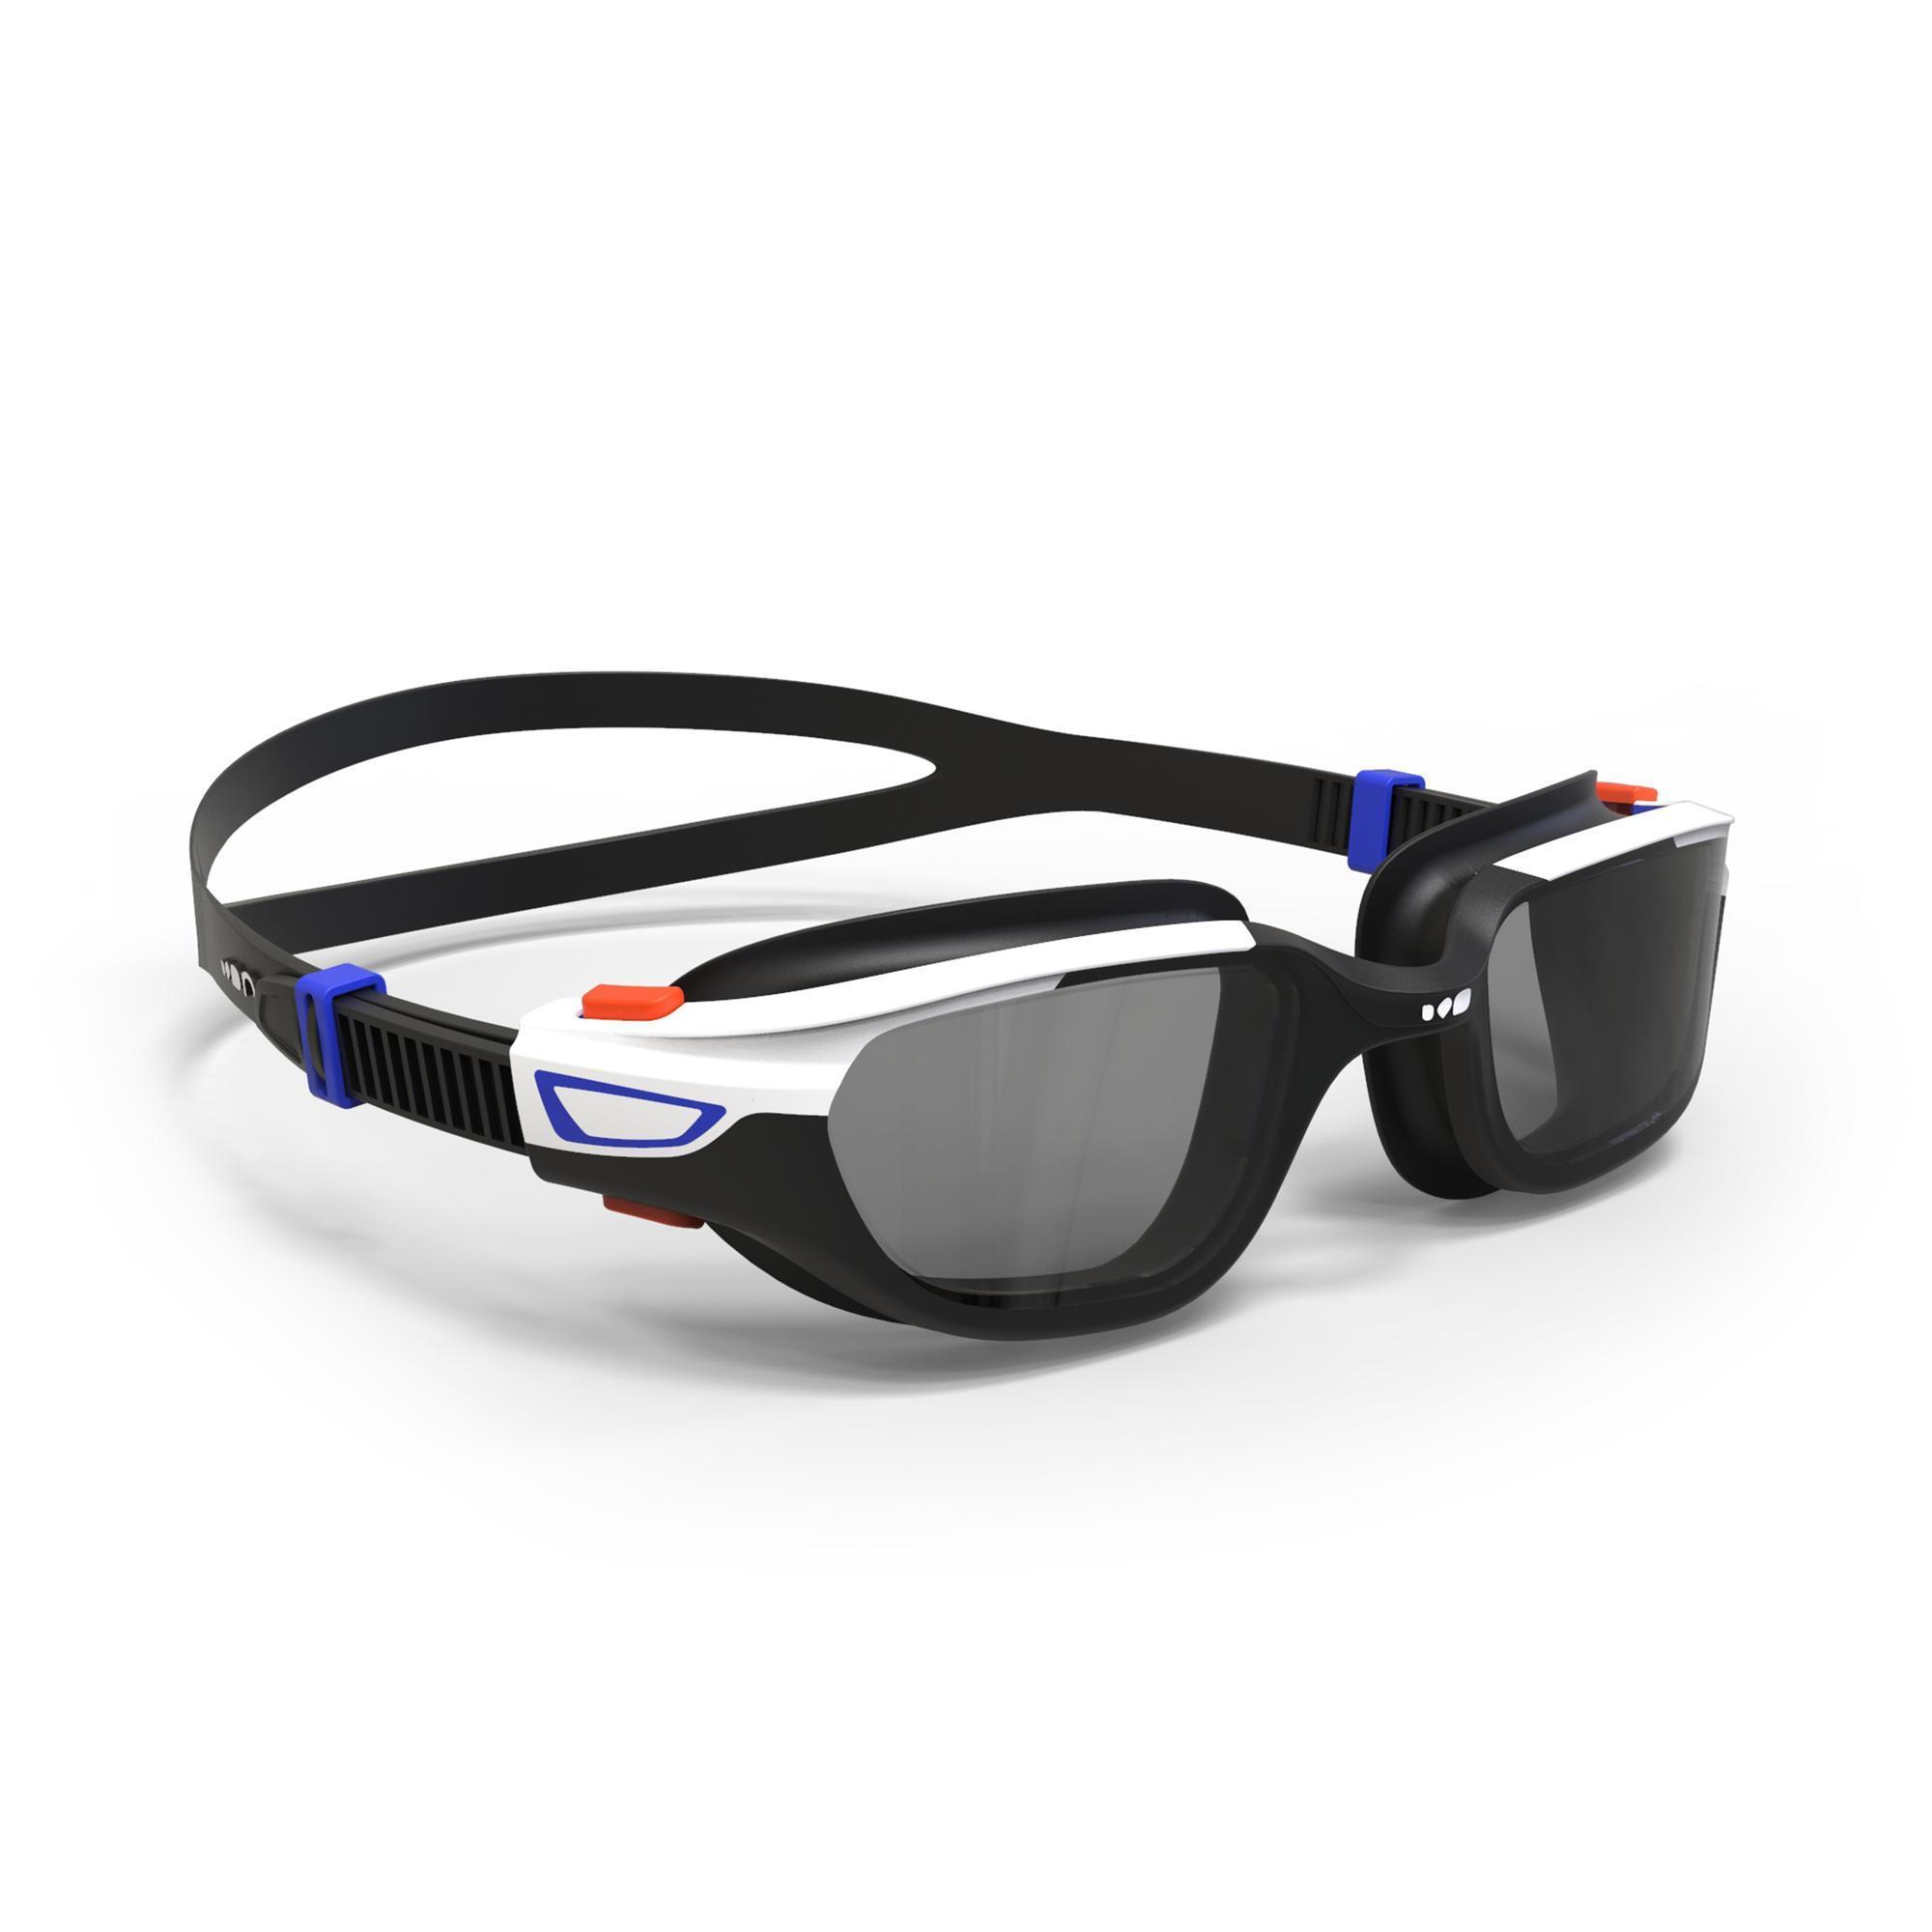 fefc28075040e5 Zwembrillen en zwemmaskers   Decathlon